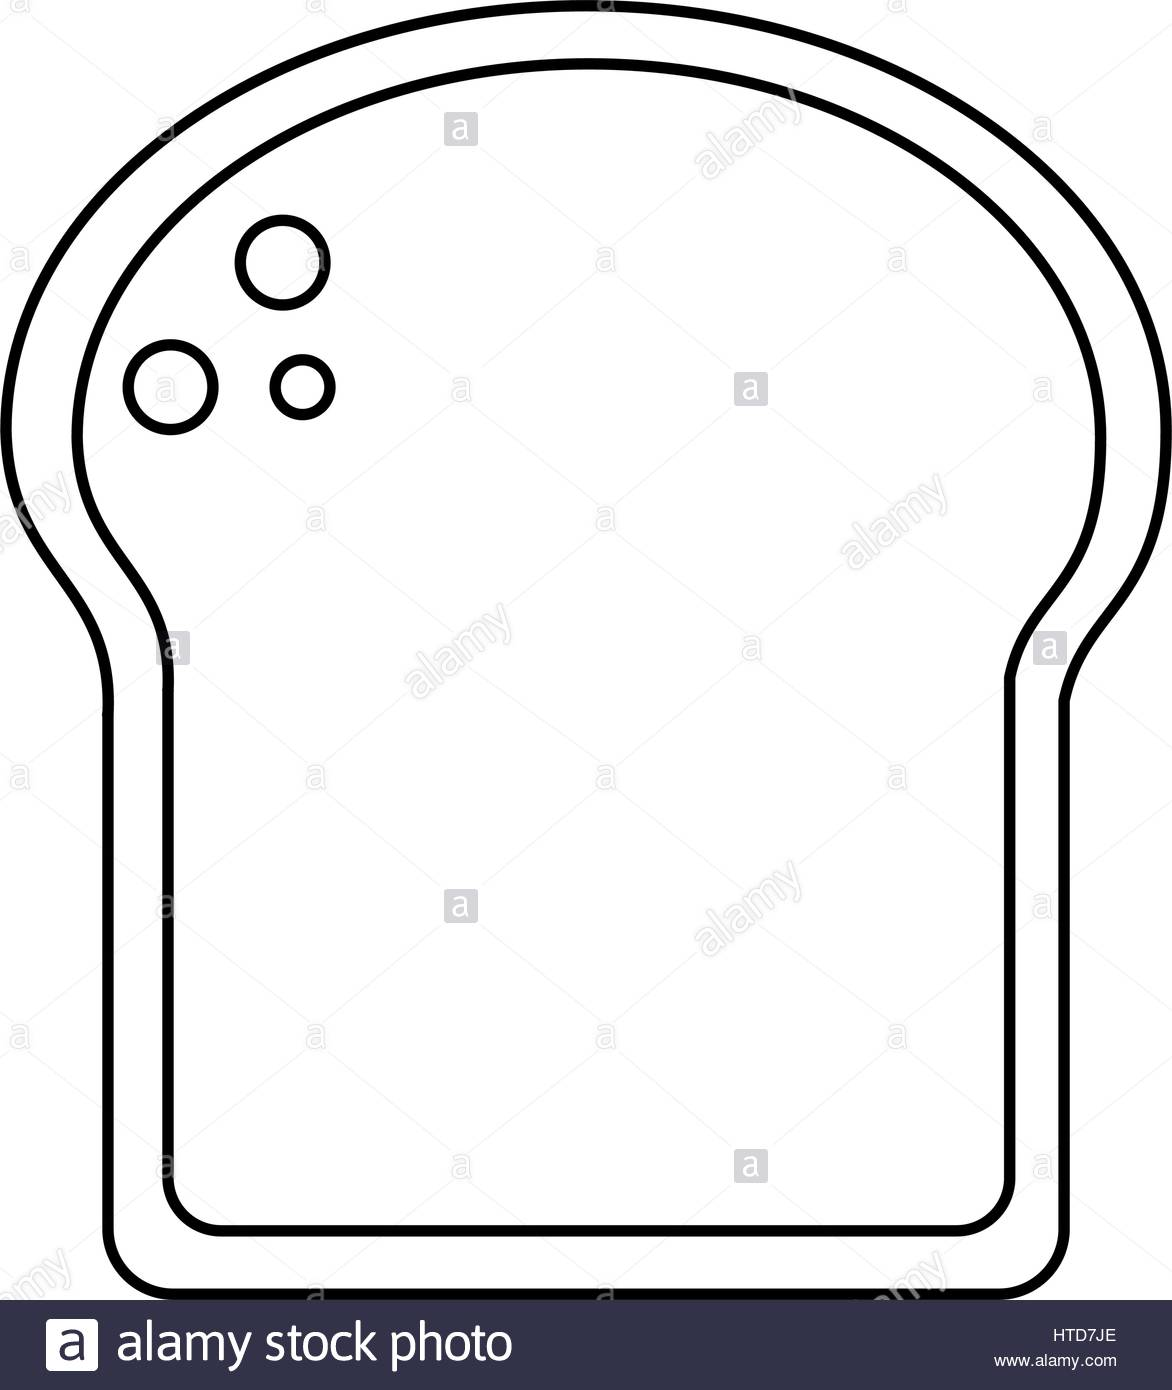 1172x1390 Slice Bread Bakery Thin Line Stock Vector Art Amp Illustration